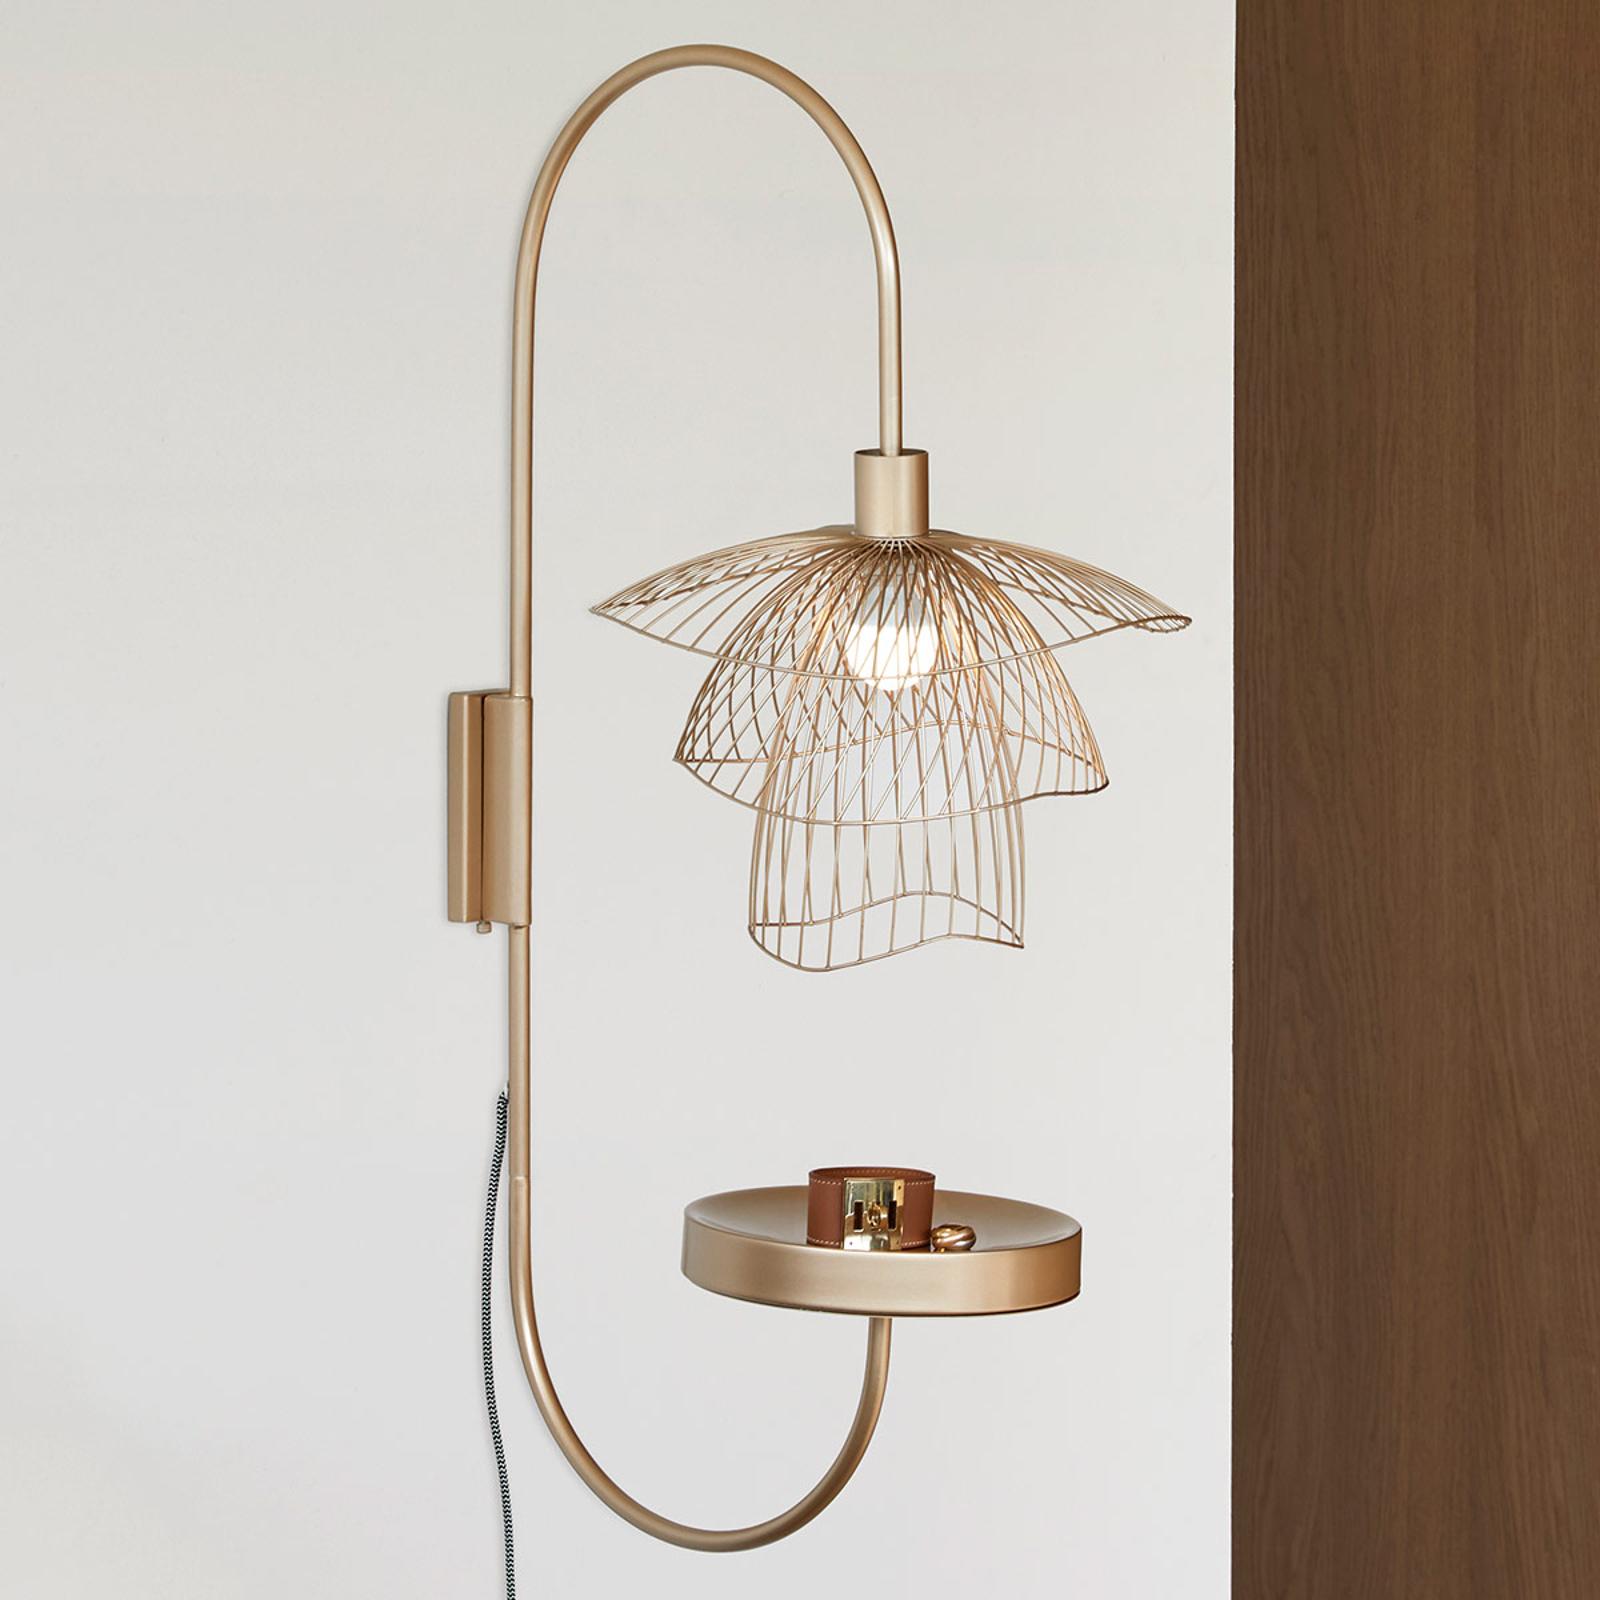 Forestier Papillon XS væglampe, champagne